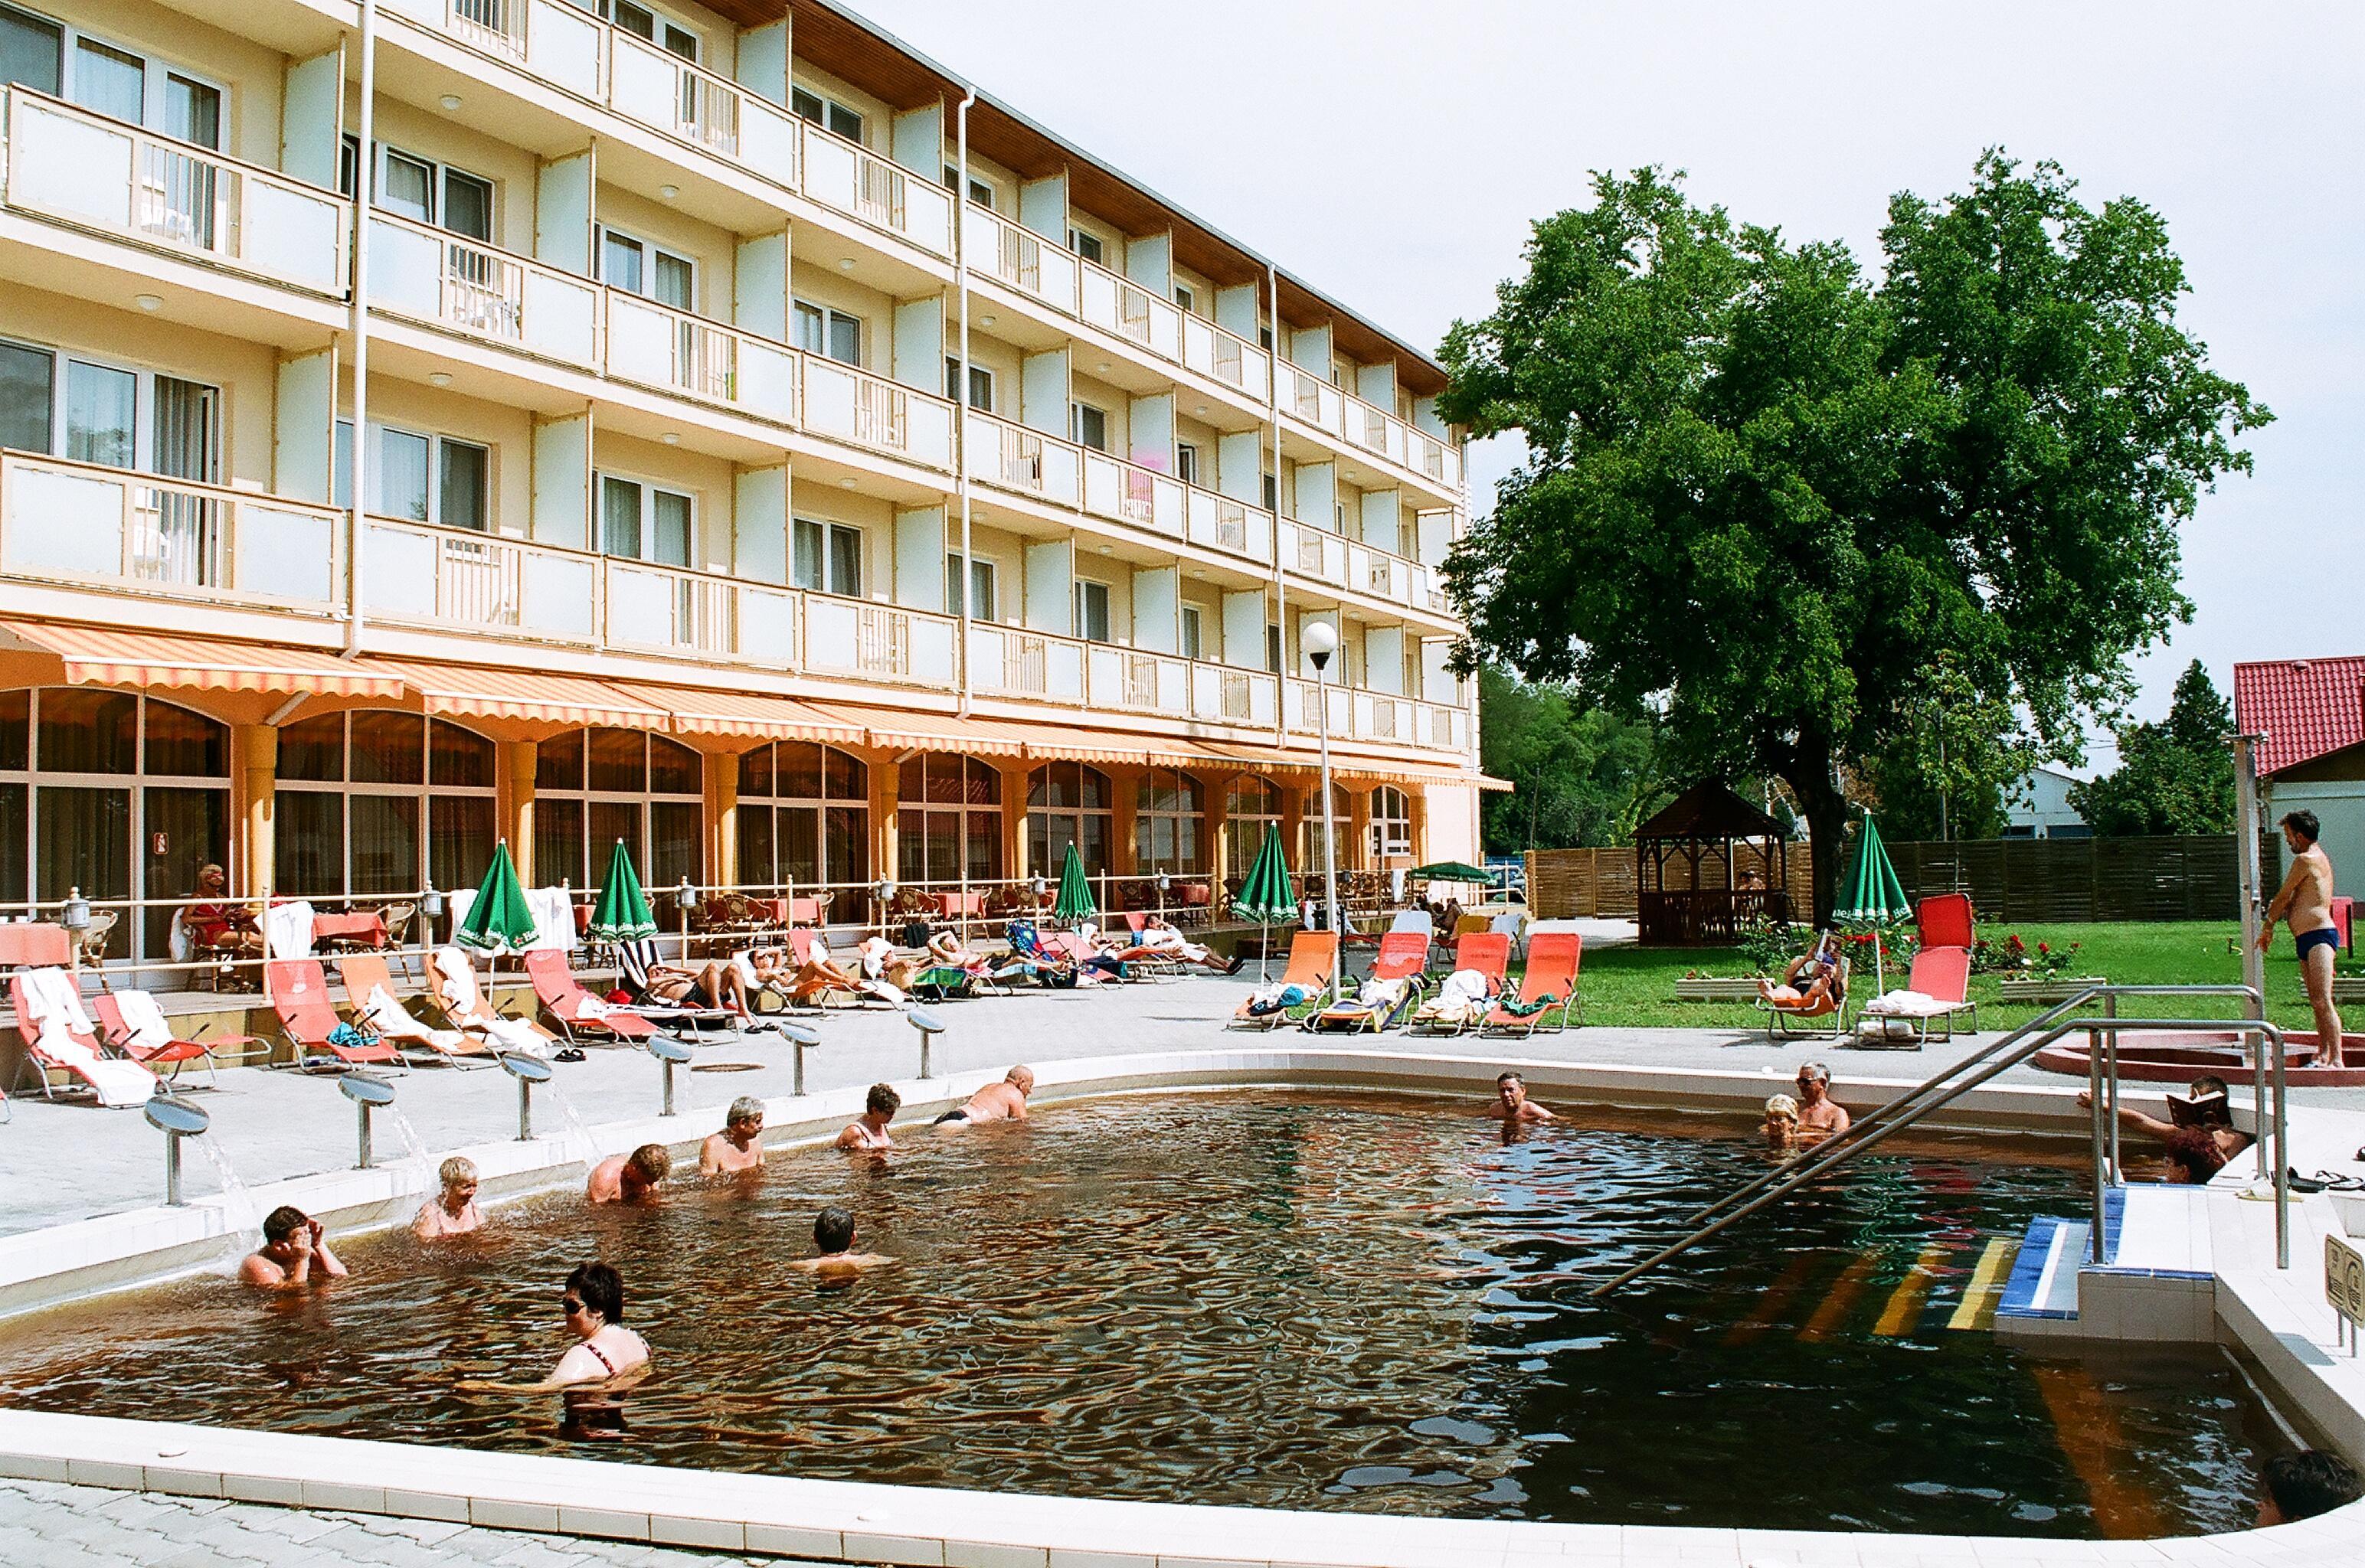 http://img.hungarospa.hu/hotel/medenceoldal.jpg